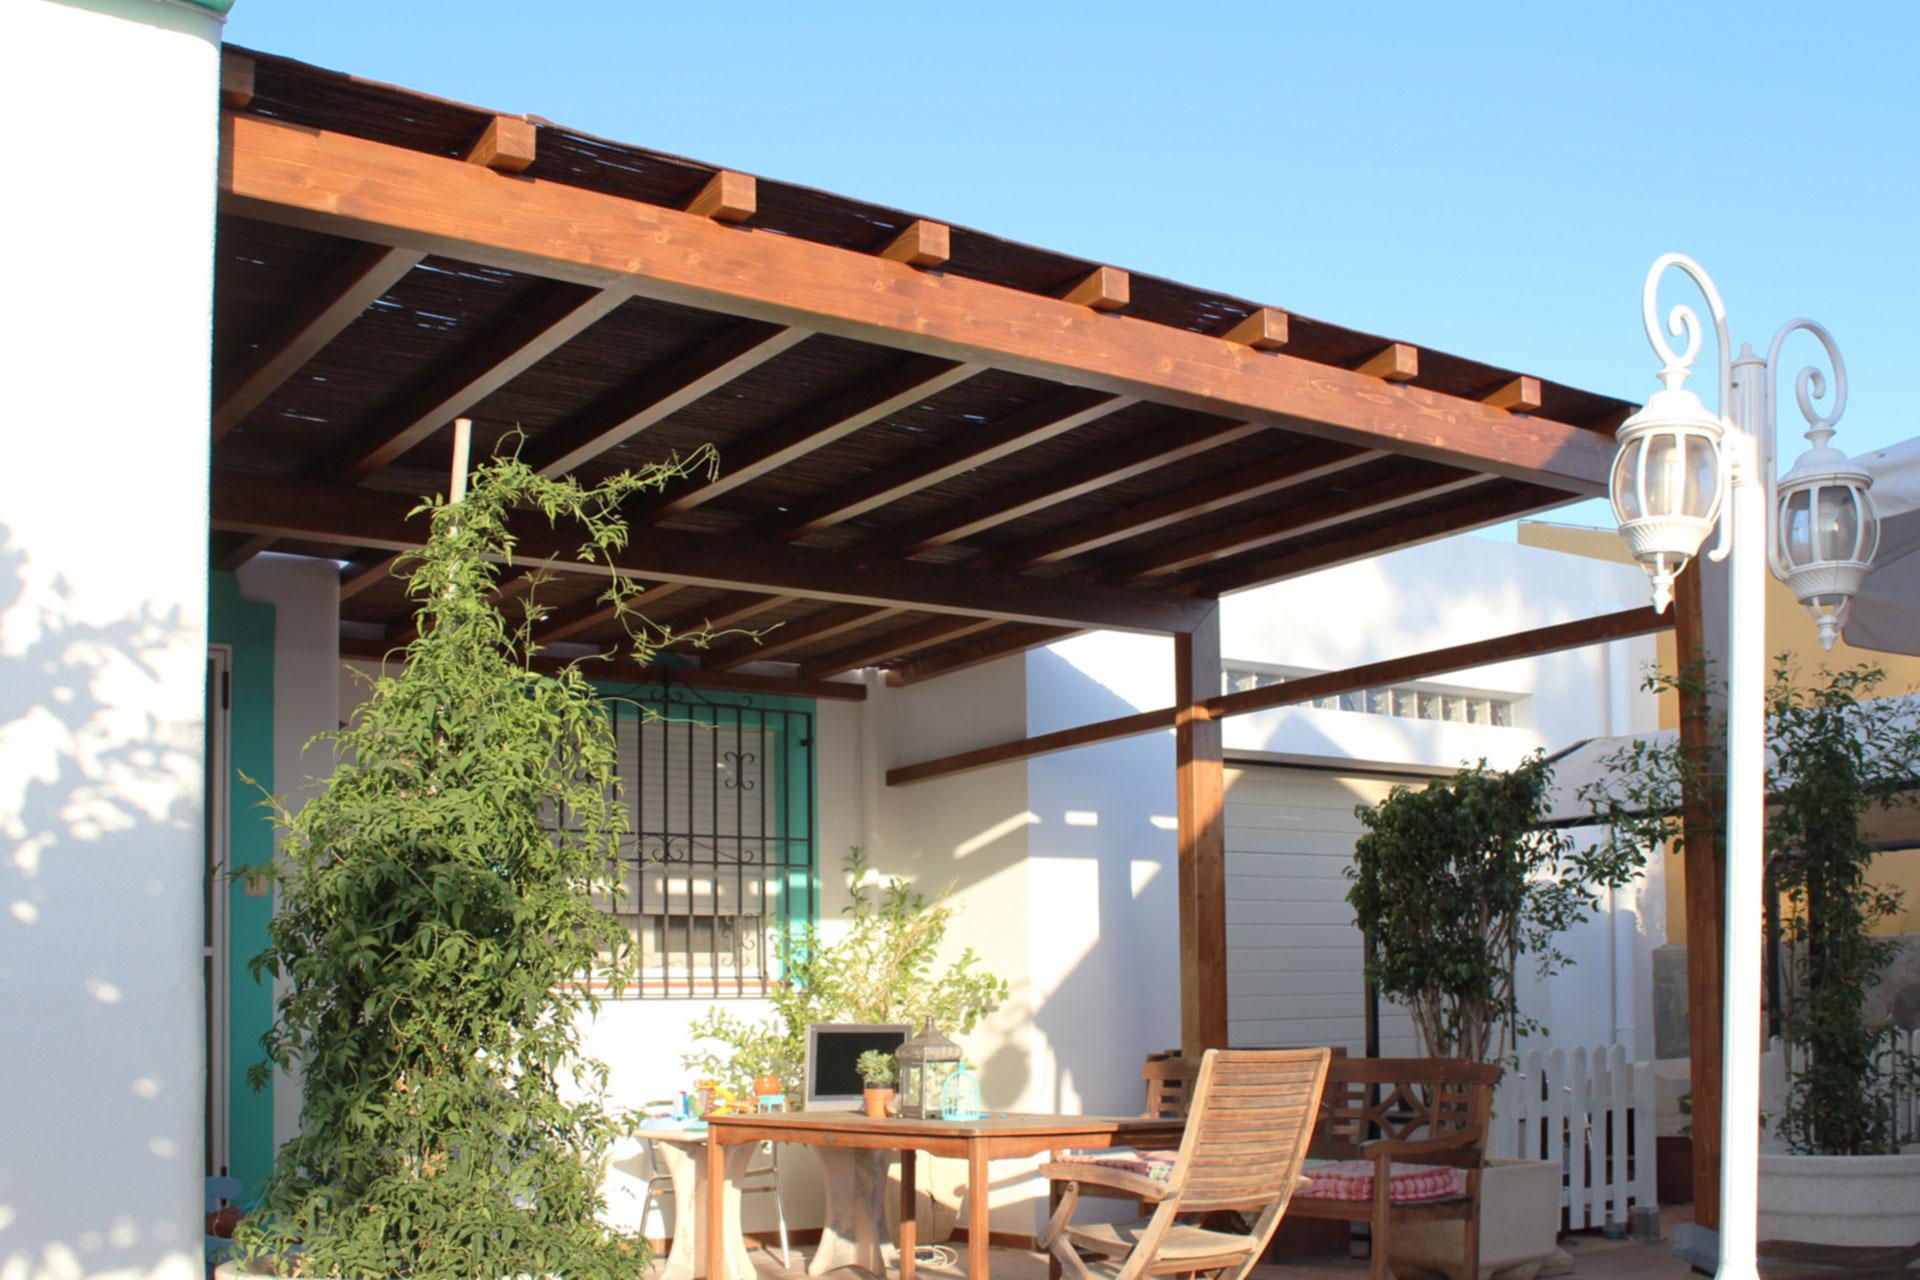 Pergolas de madera para jardin benoit roubaud - Pergolas de madera valencia ...